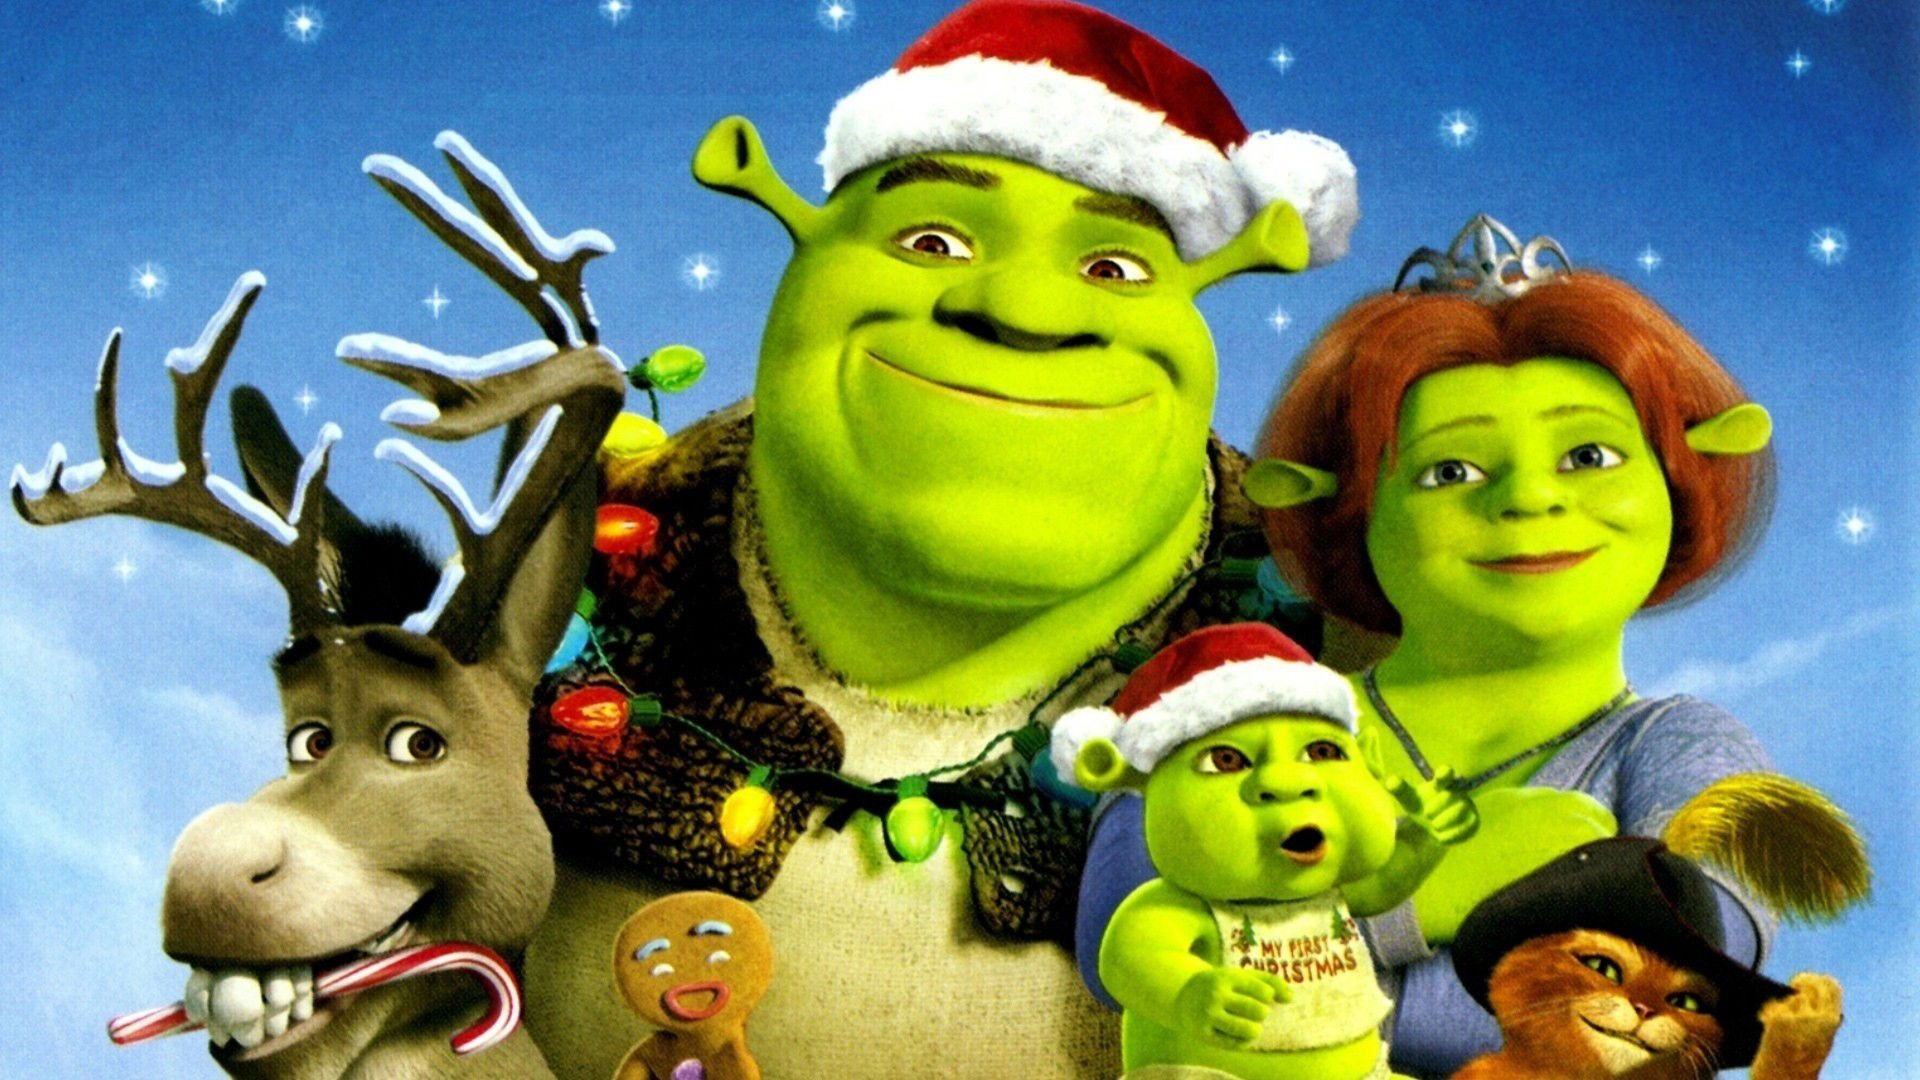 Shrek Wallpapers Top Free Shrek Backgrounds Wallpaperaccess